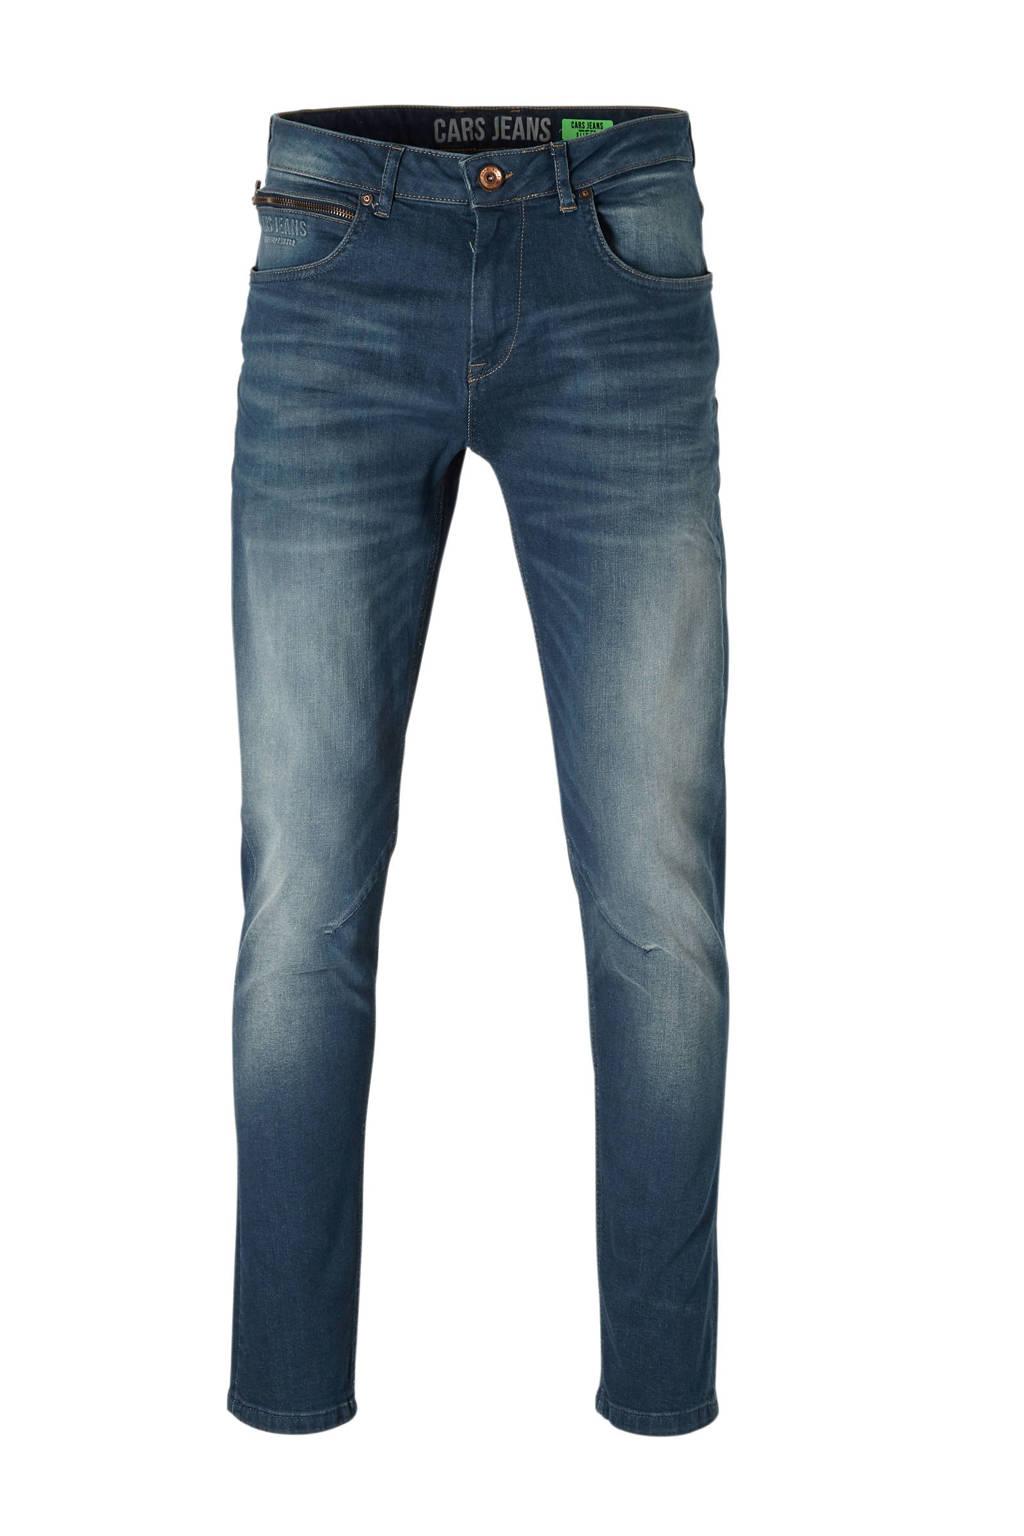 Cars  slim Atkins slim fit jeans, Forest blue used